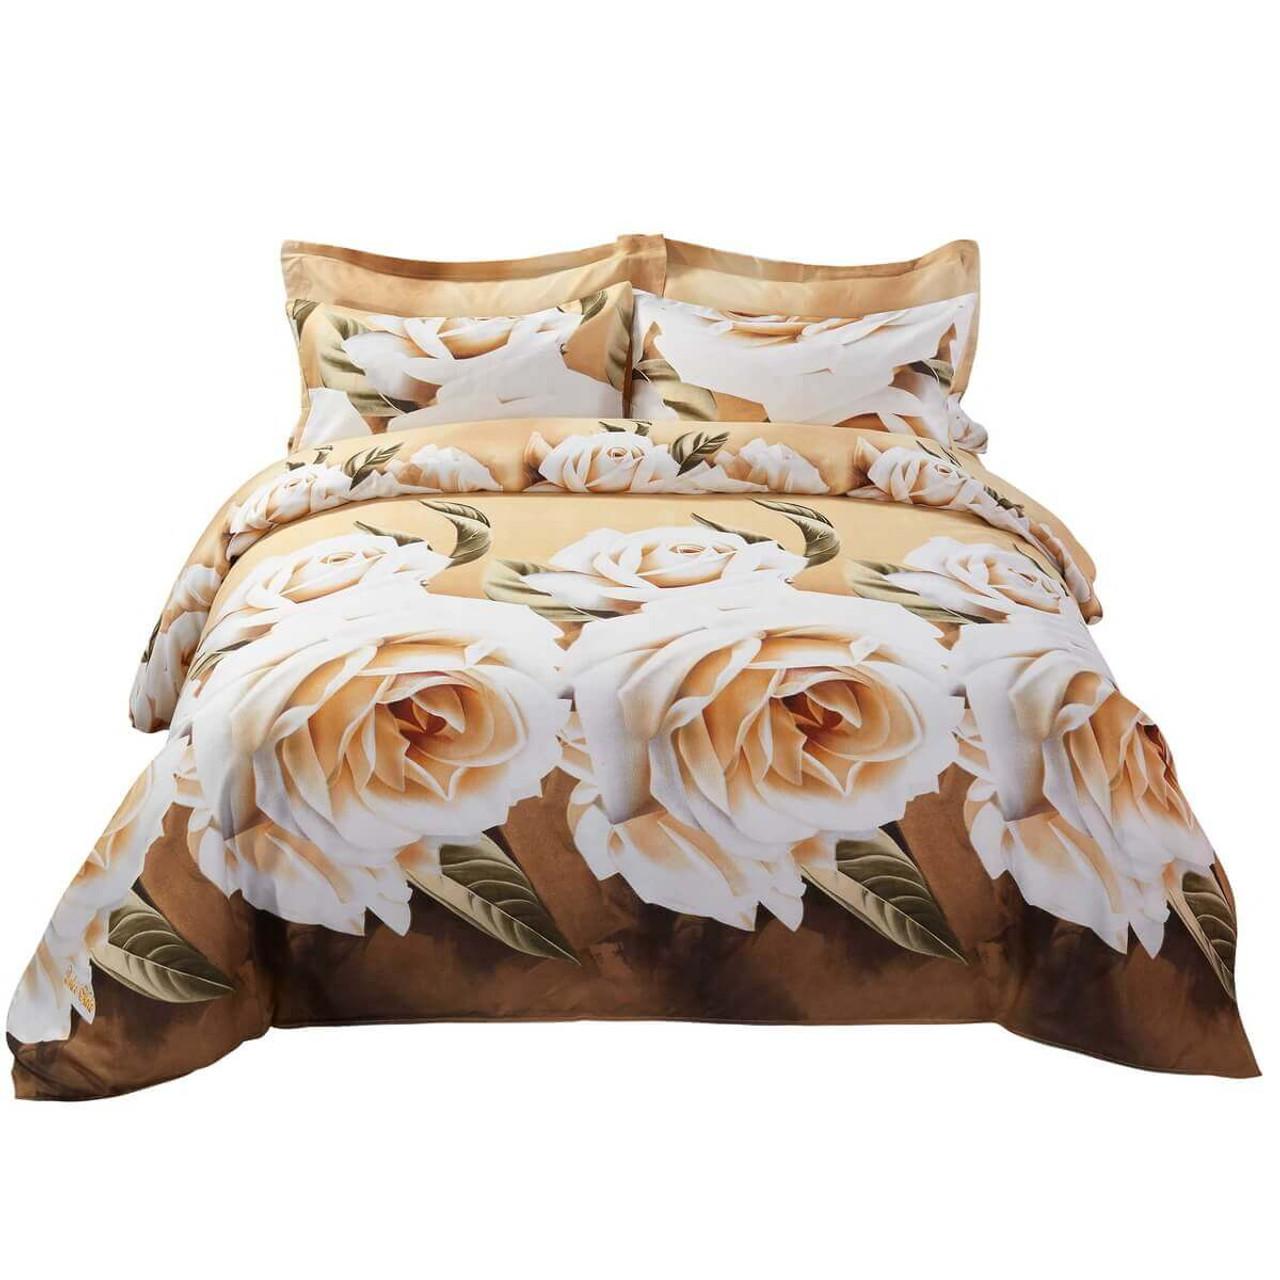 DM710Q Drop-shipping Wholesale Bedding Sets